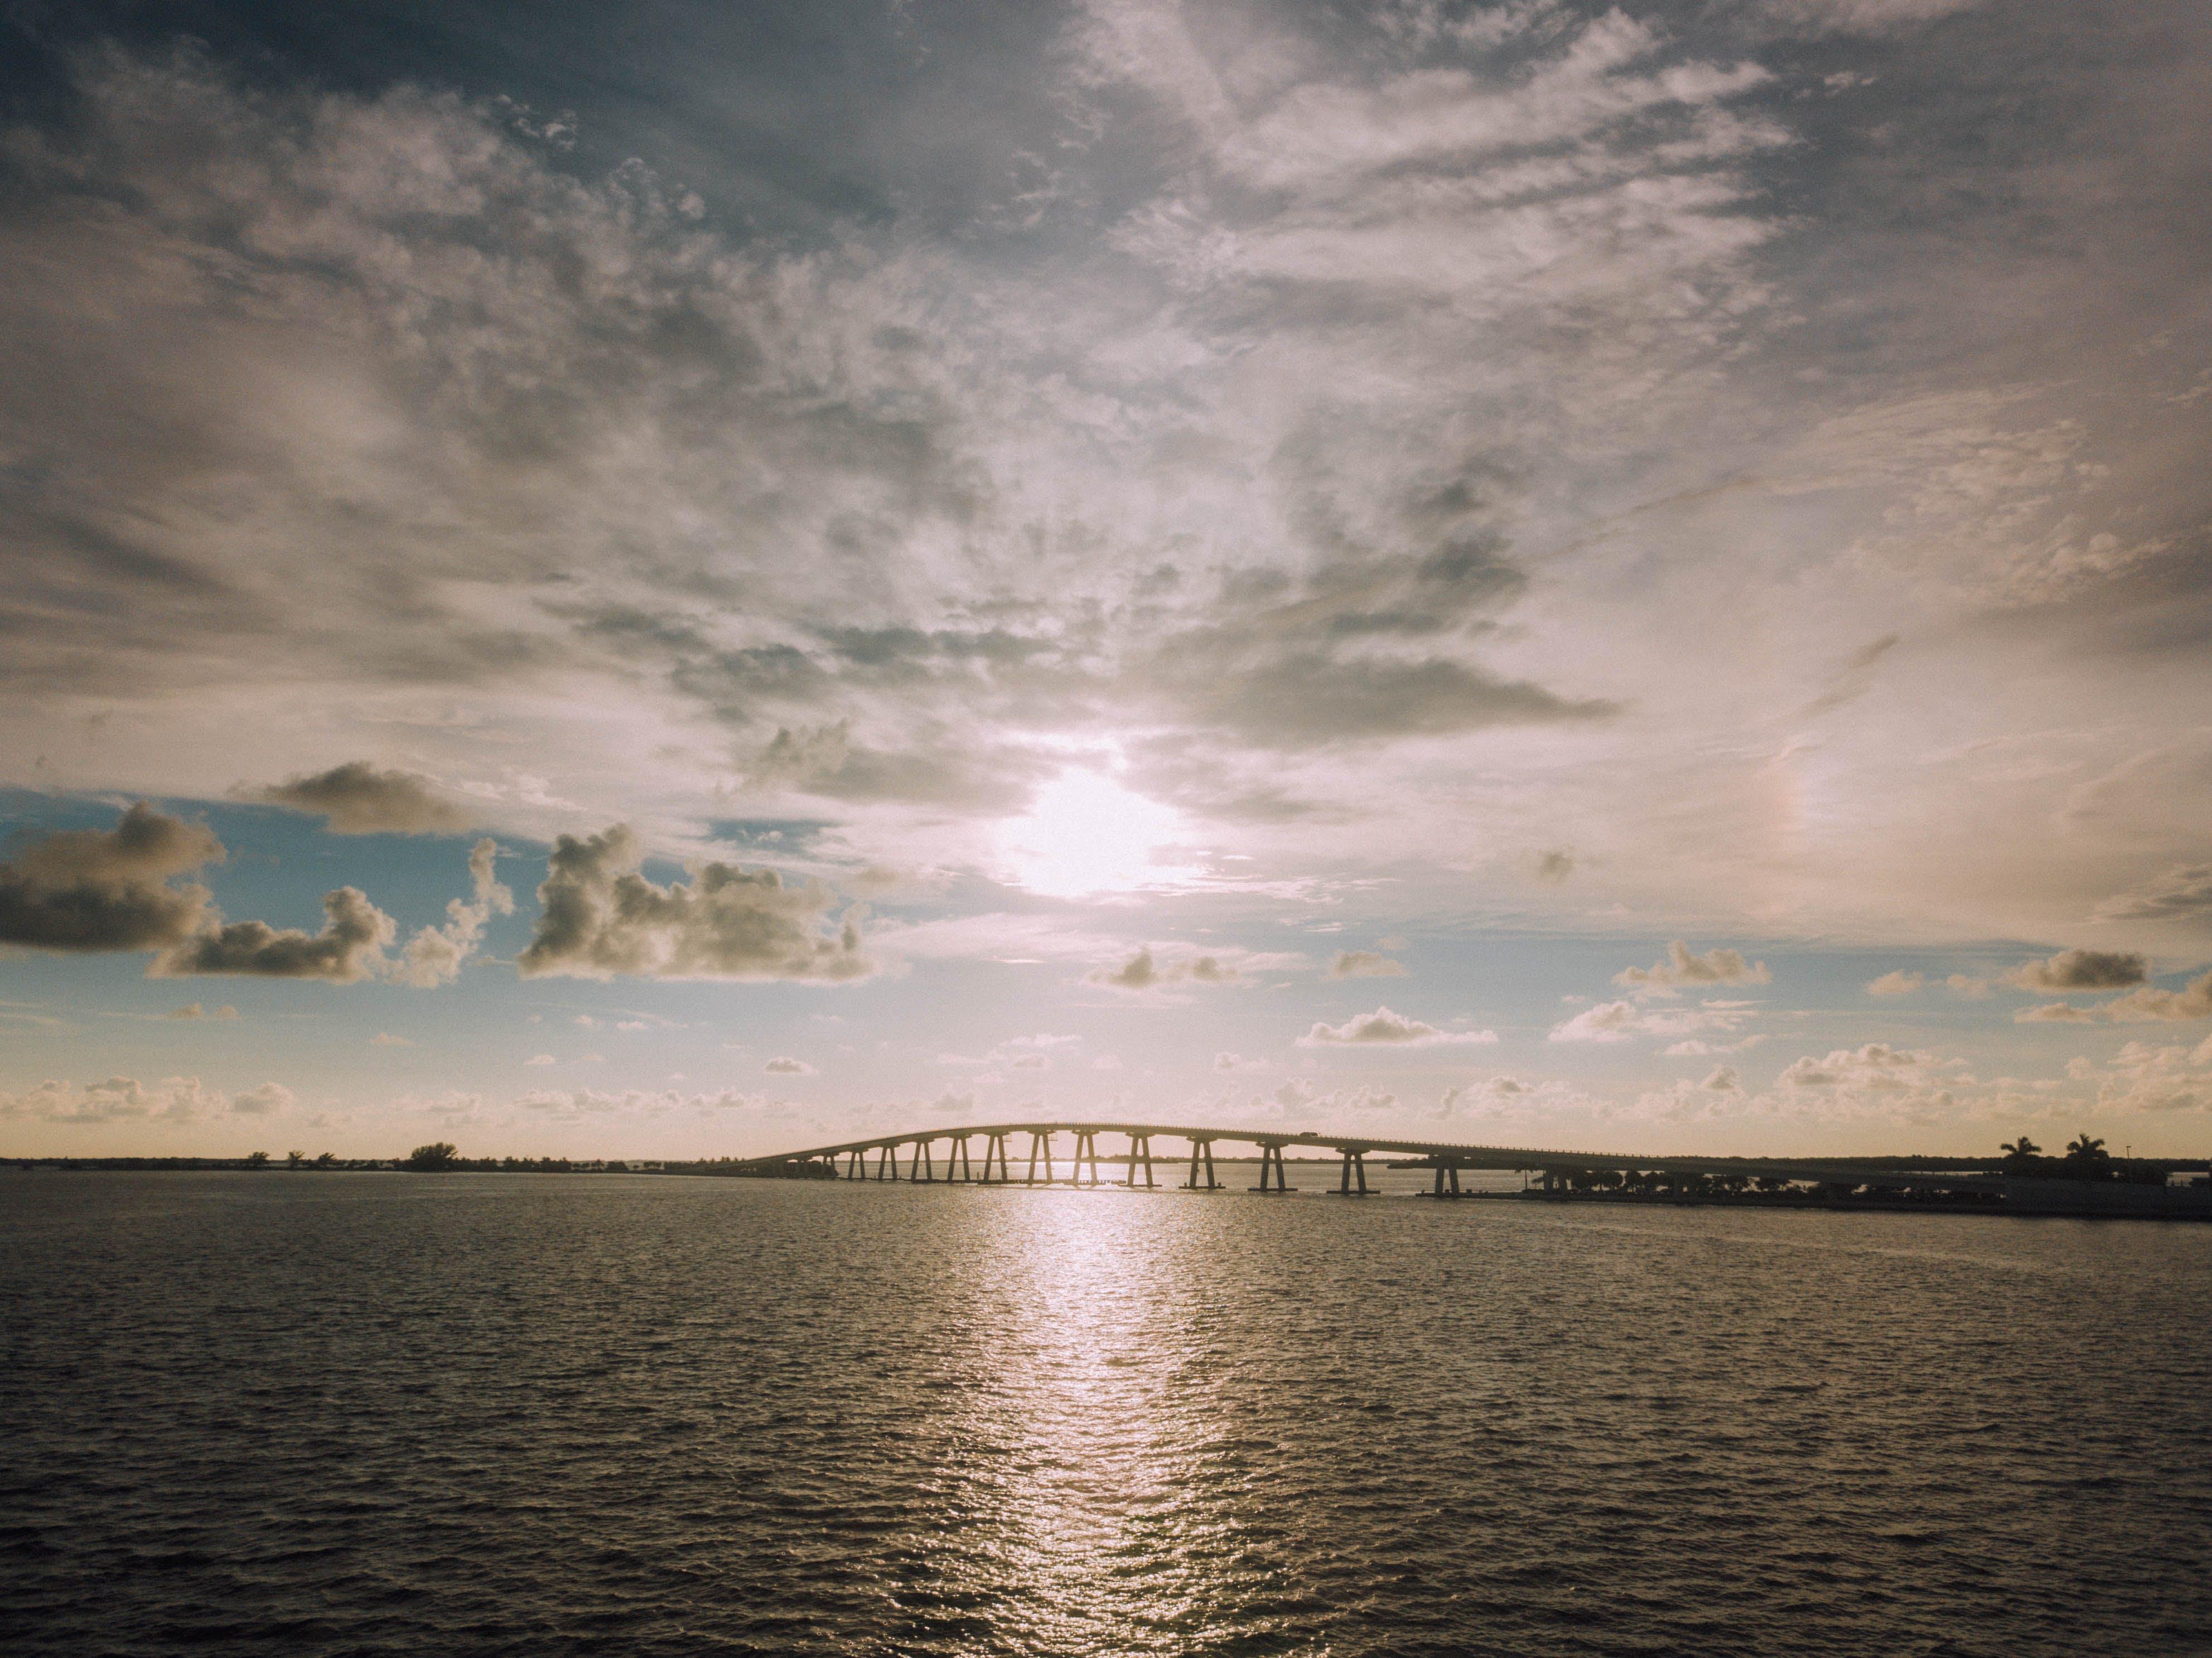 beach, bridge, cloud